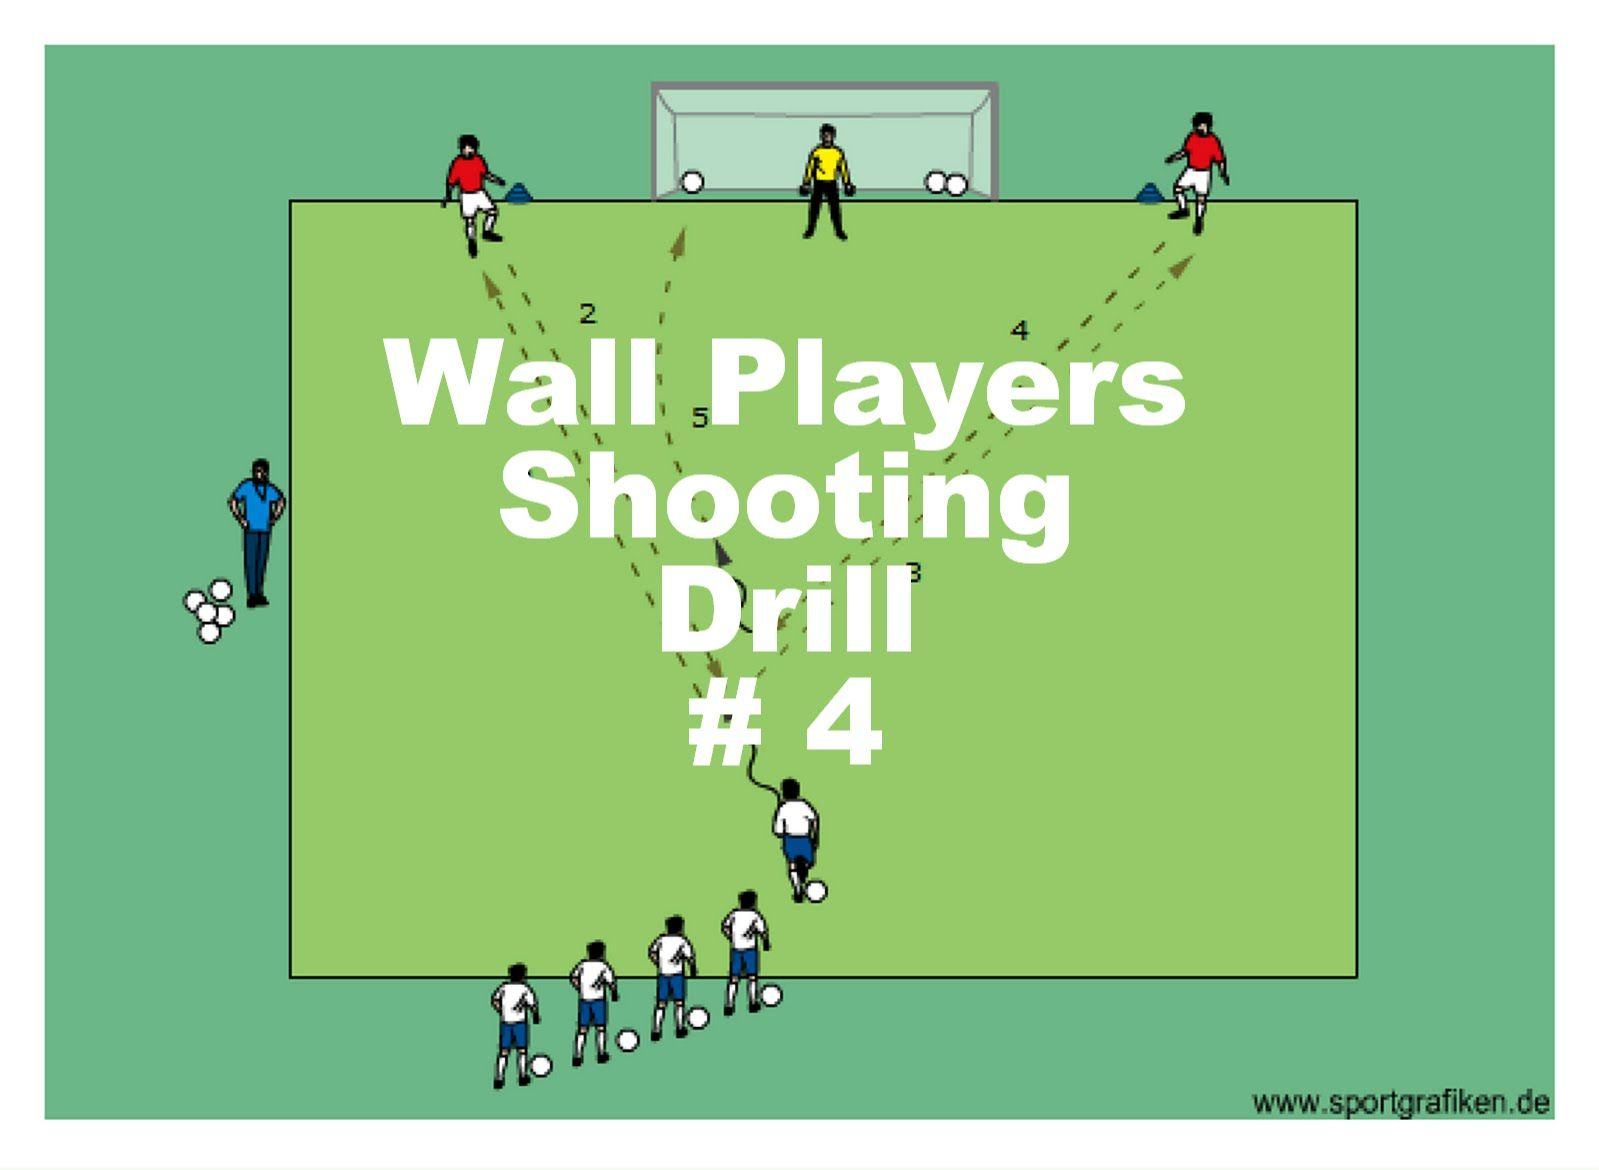 Fun Shooting Drill Shooting Tips: Easy Combination Soccer Shooting Drill